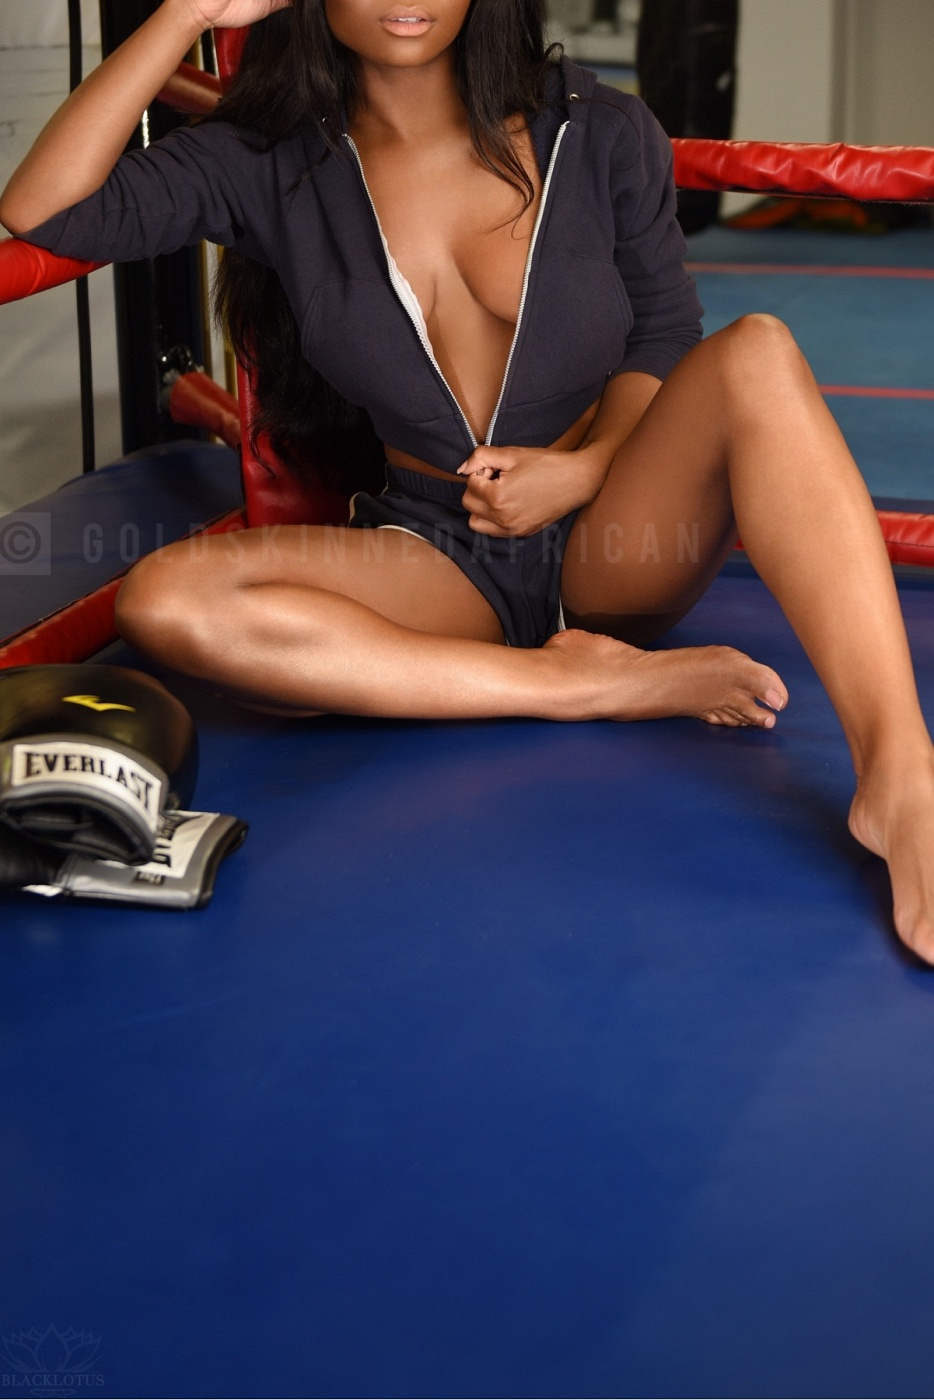 Lourdes Harris